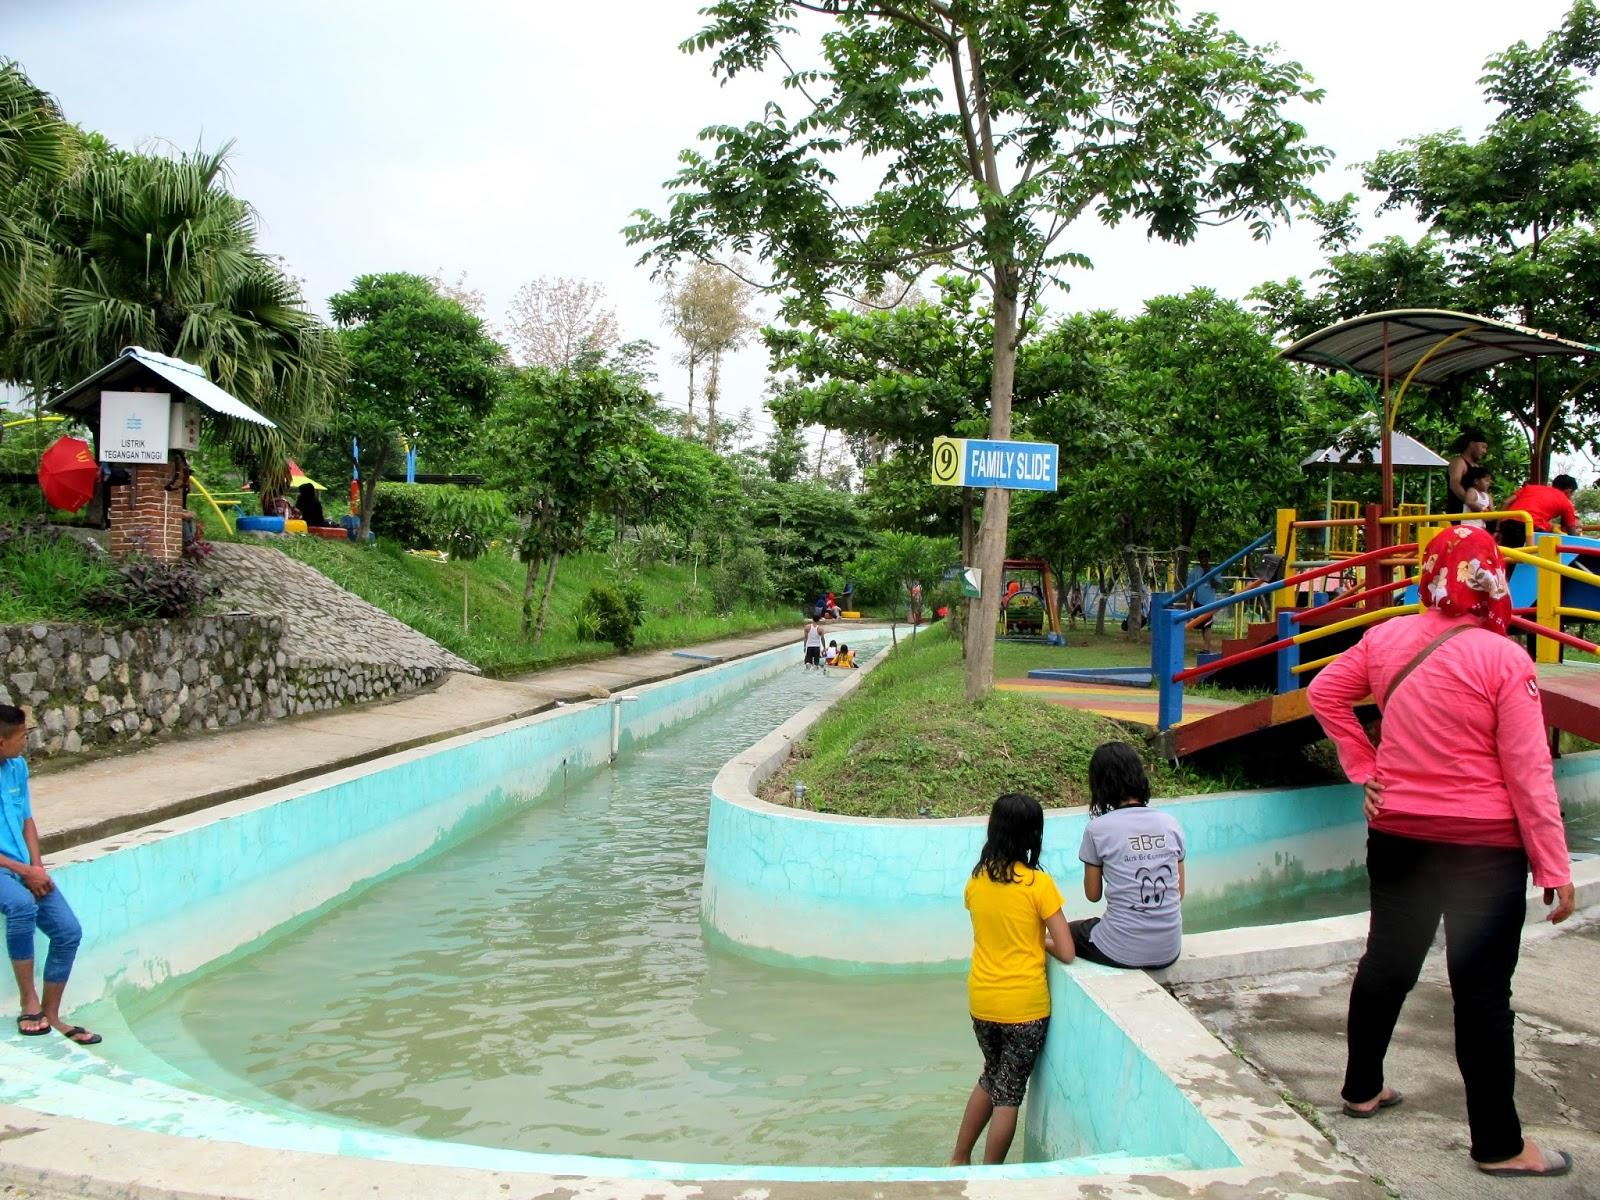 Wisata Joglo Park Pacet Haya Zone Perahu Kayuh Taman Mini